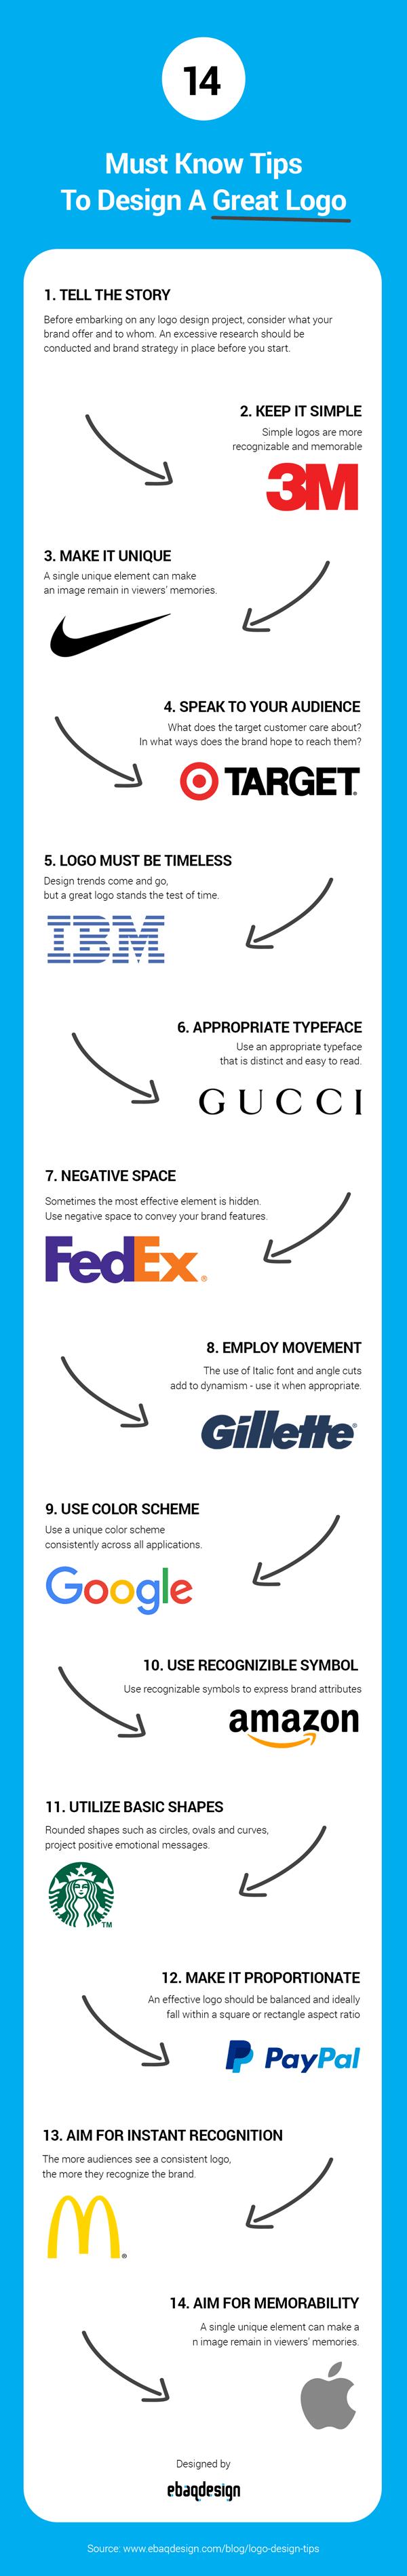 tips great logo design